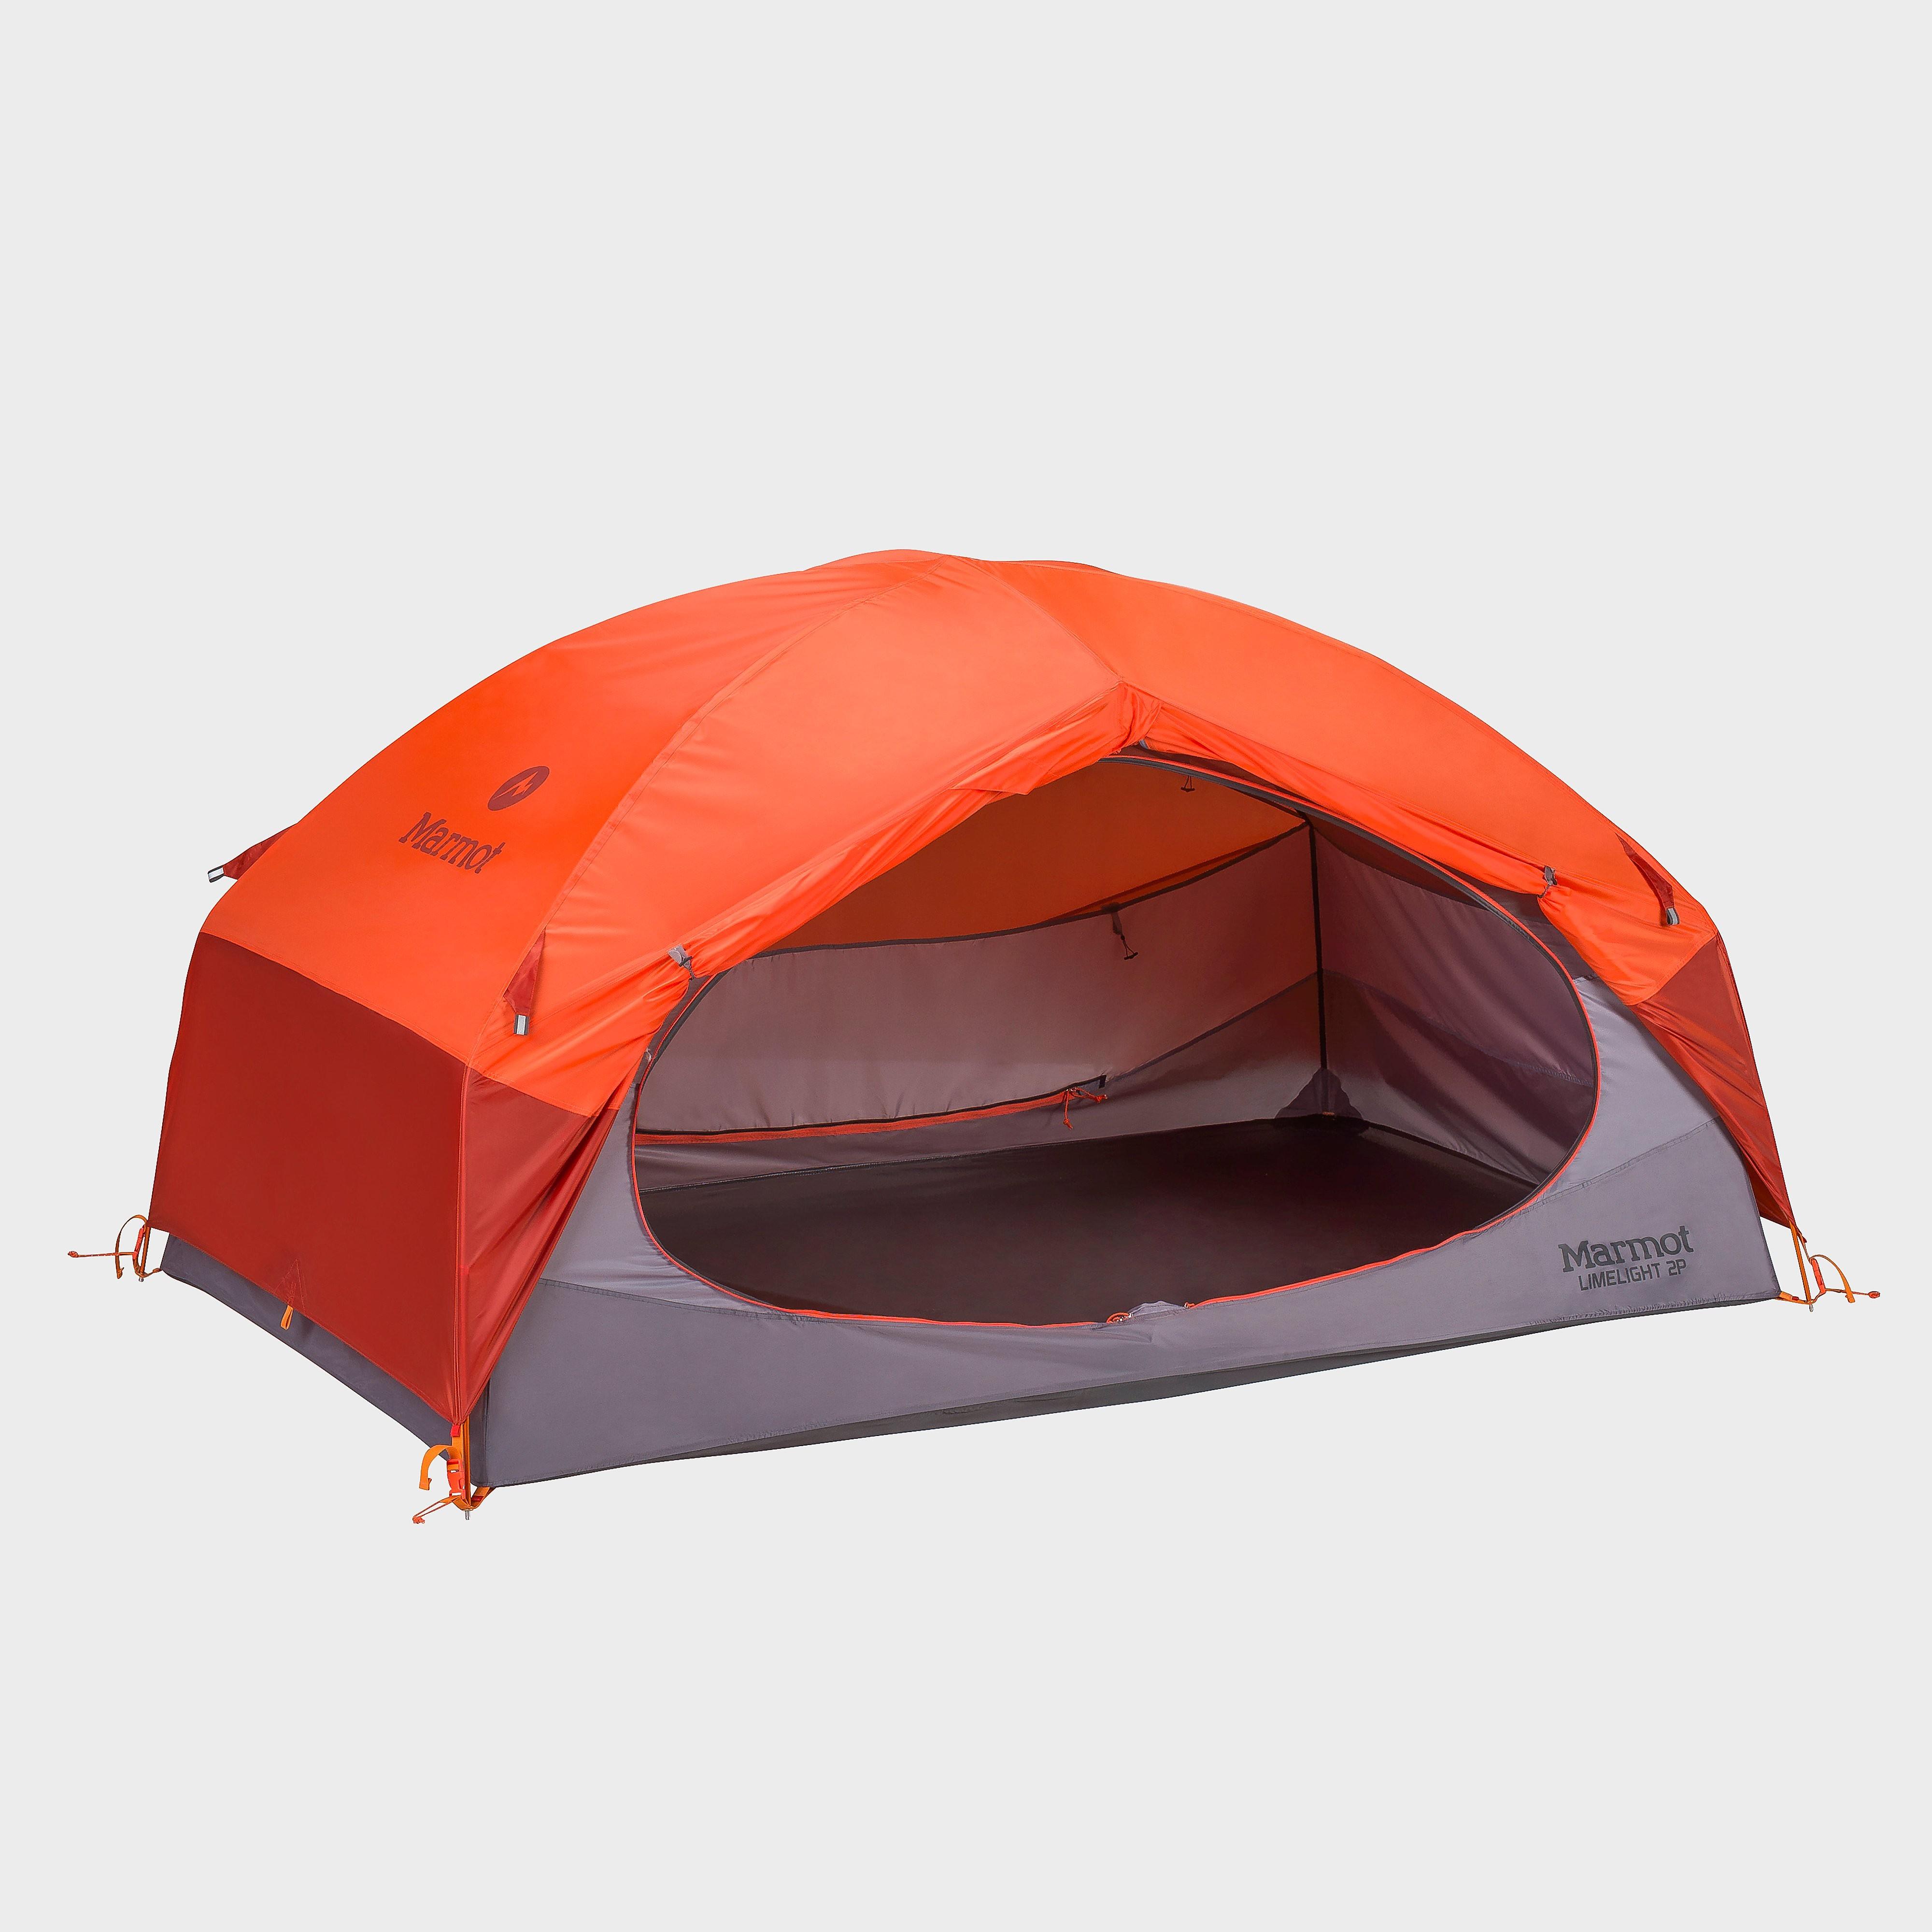 Marmot Limelight 2 Man Tent